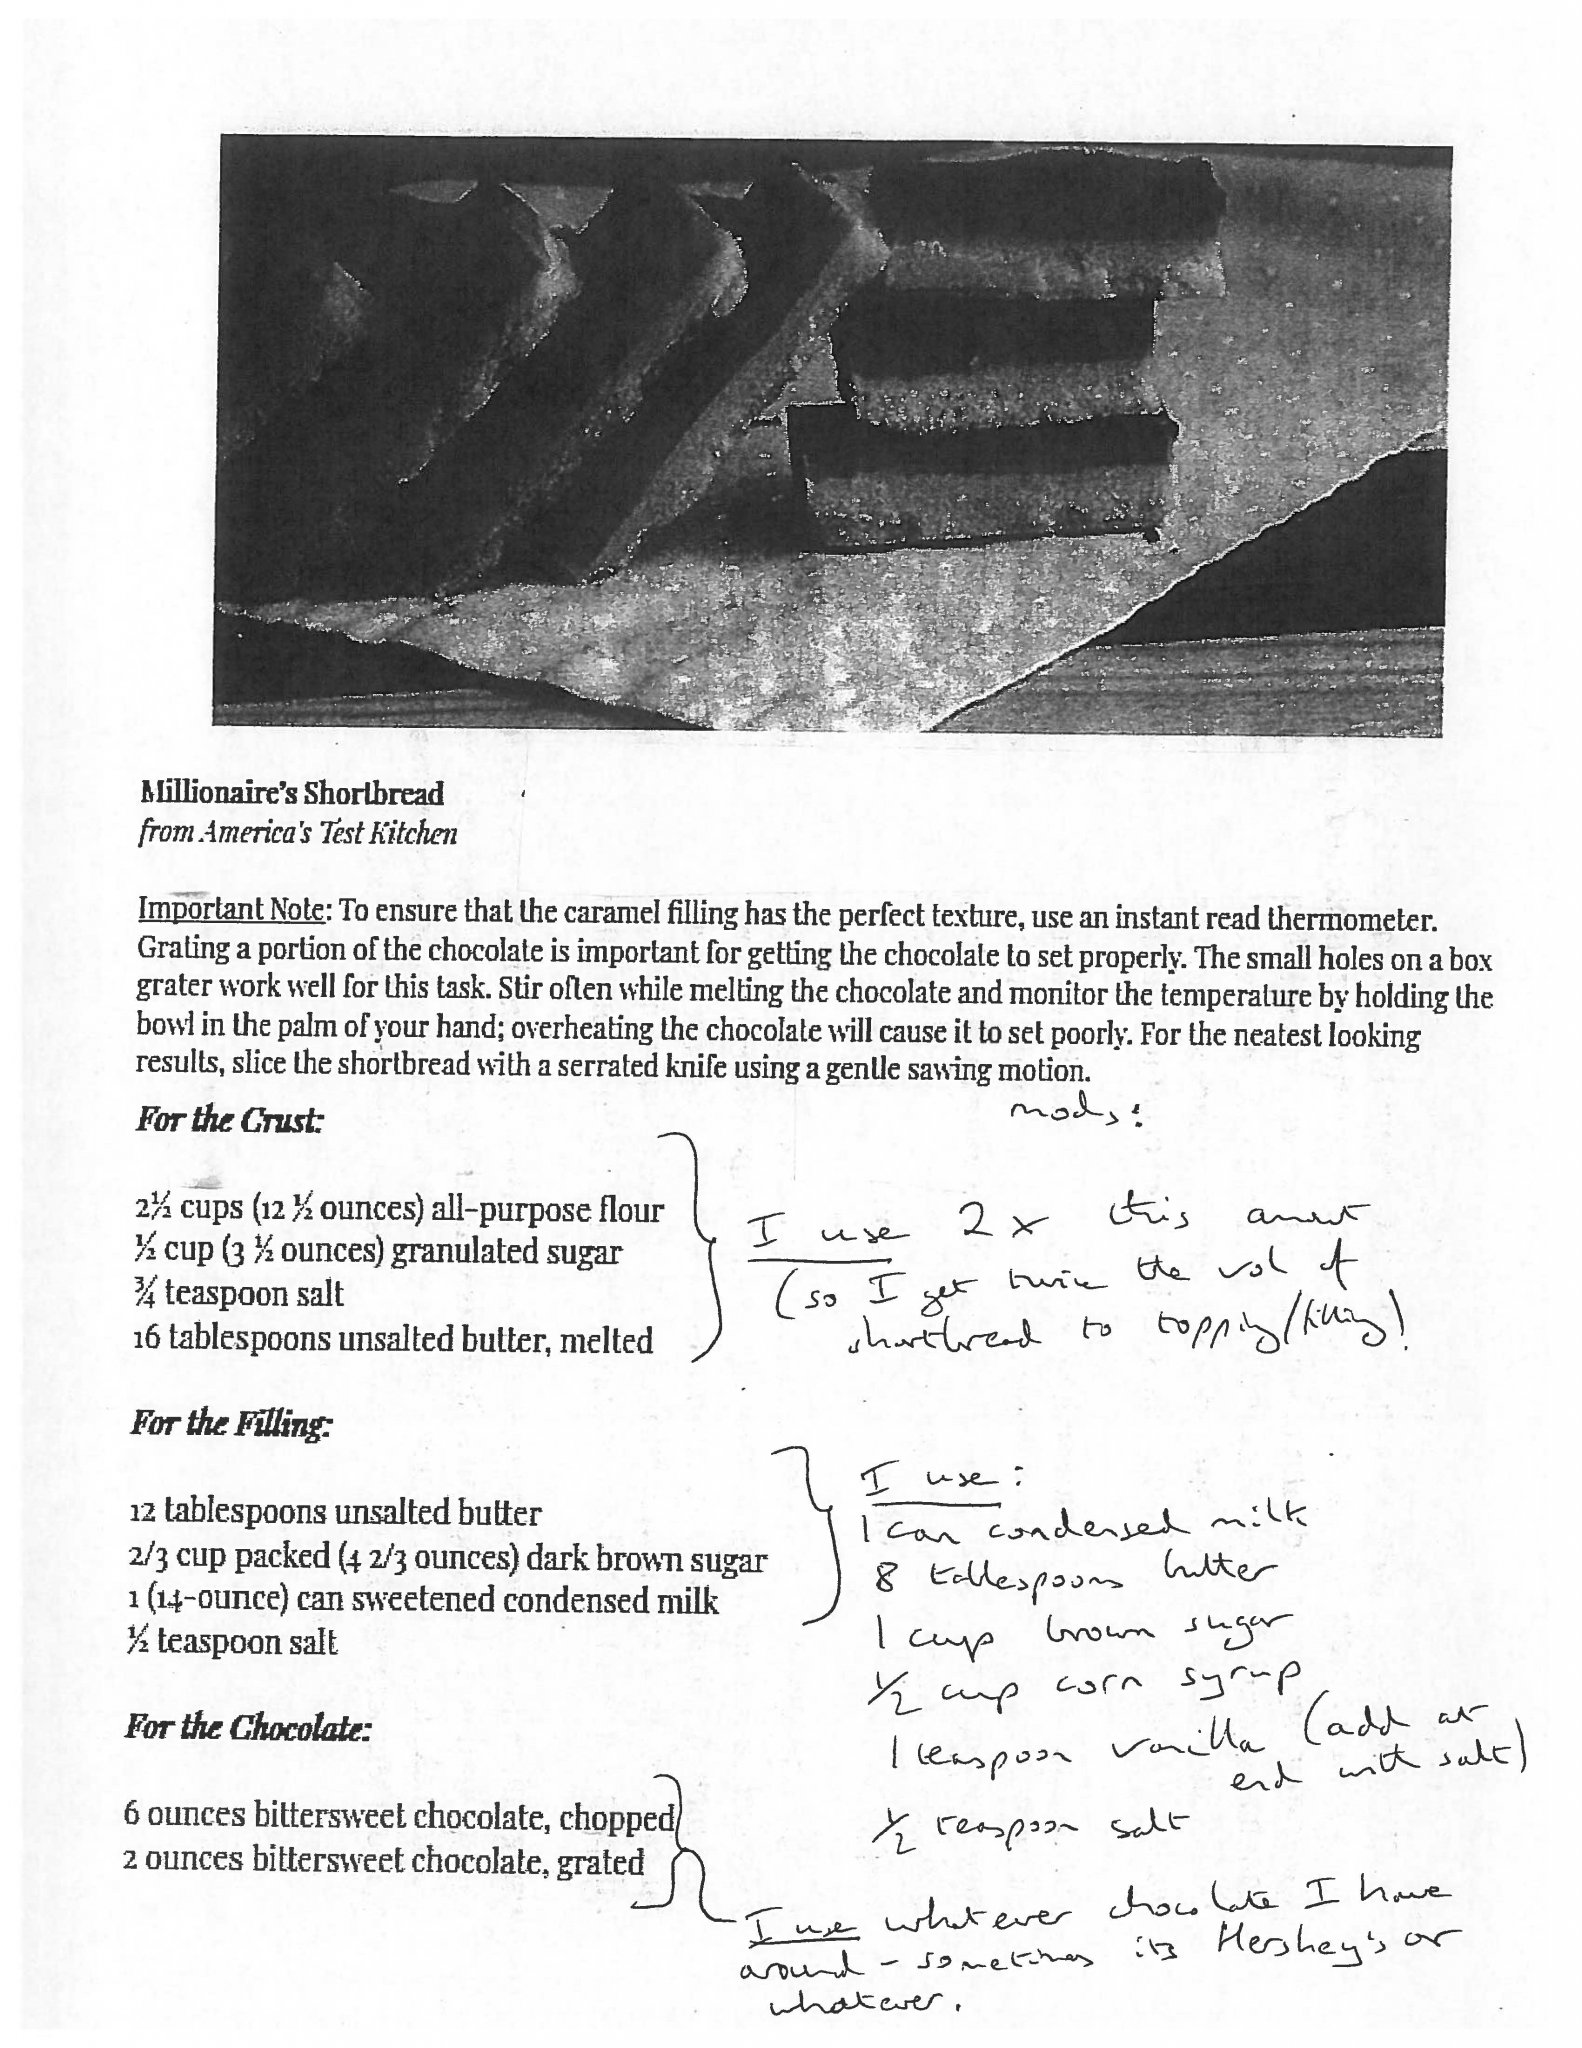 Recipe Millionaire's Shortbread_Page_1.jpg